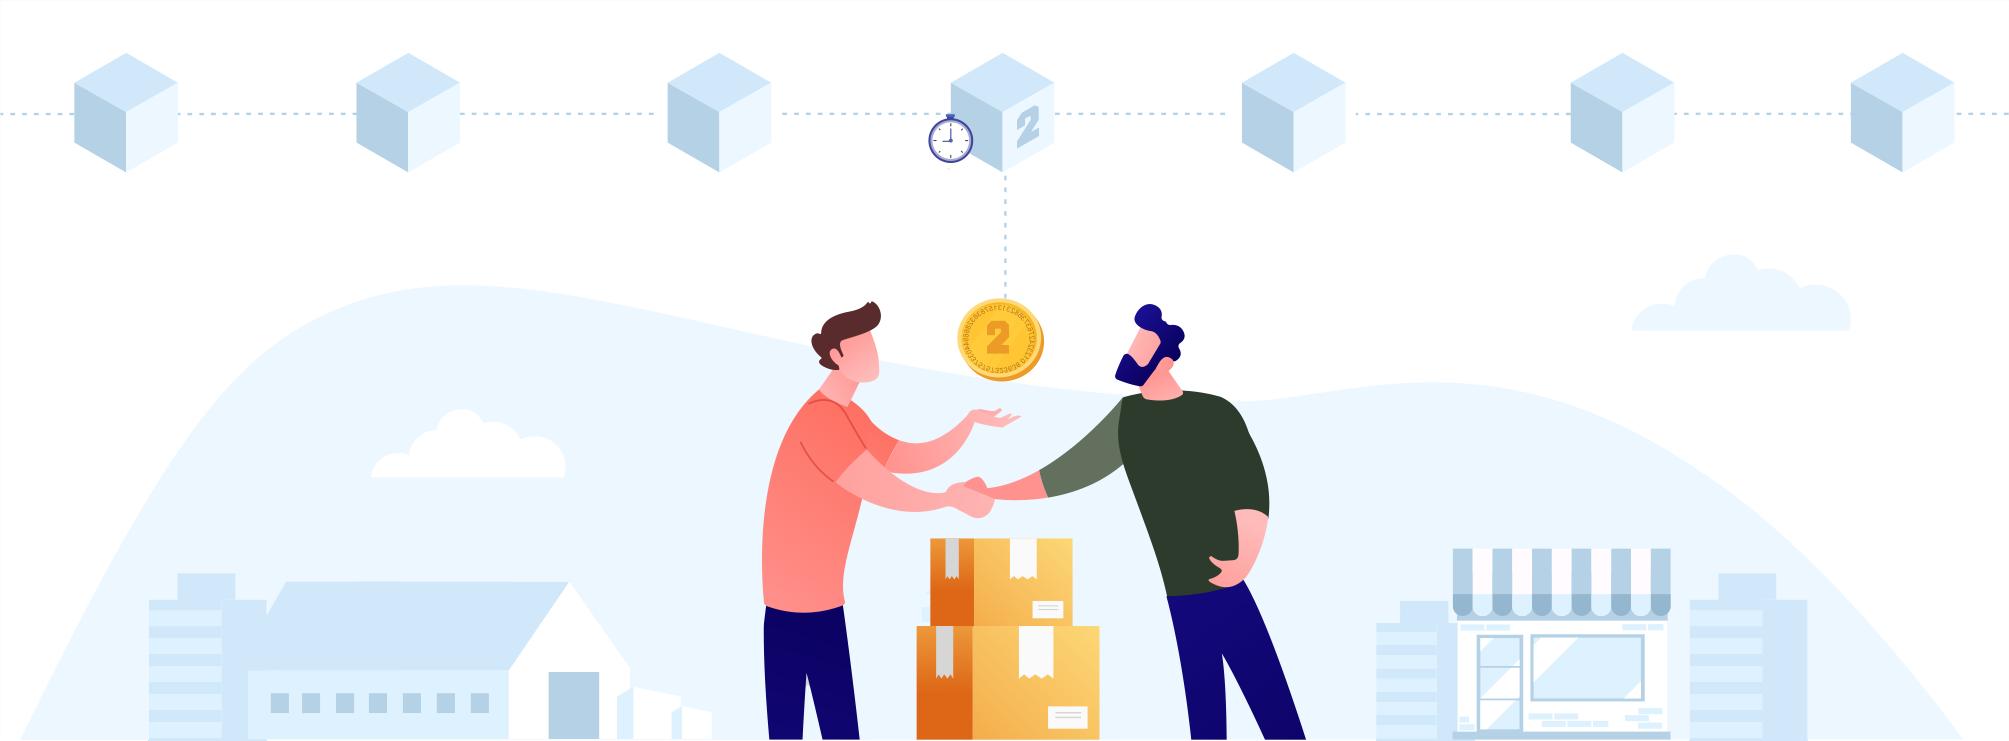 blockchain-nft-supplychain-smart-contract